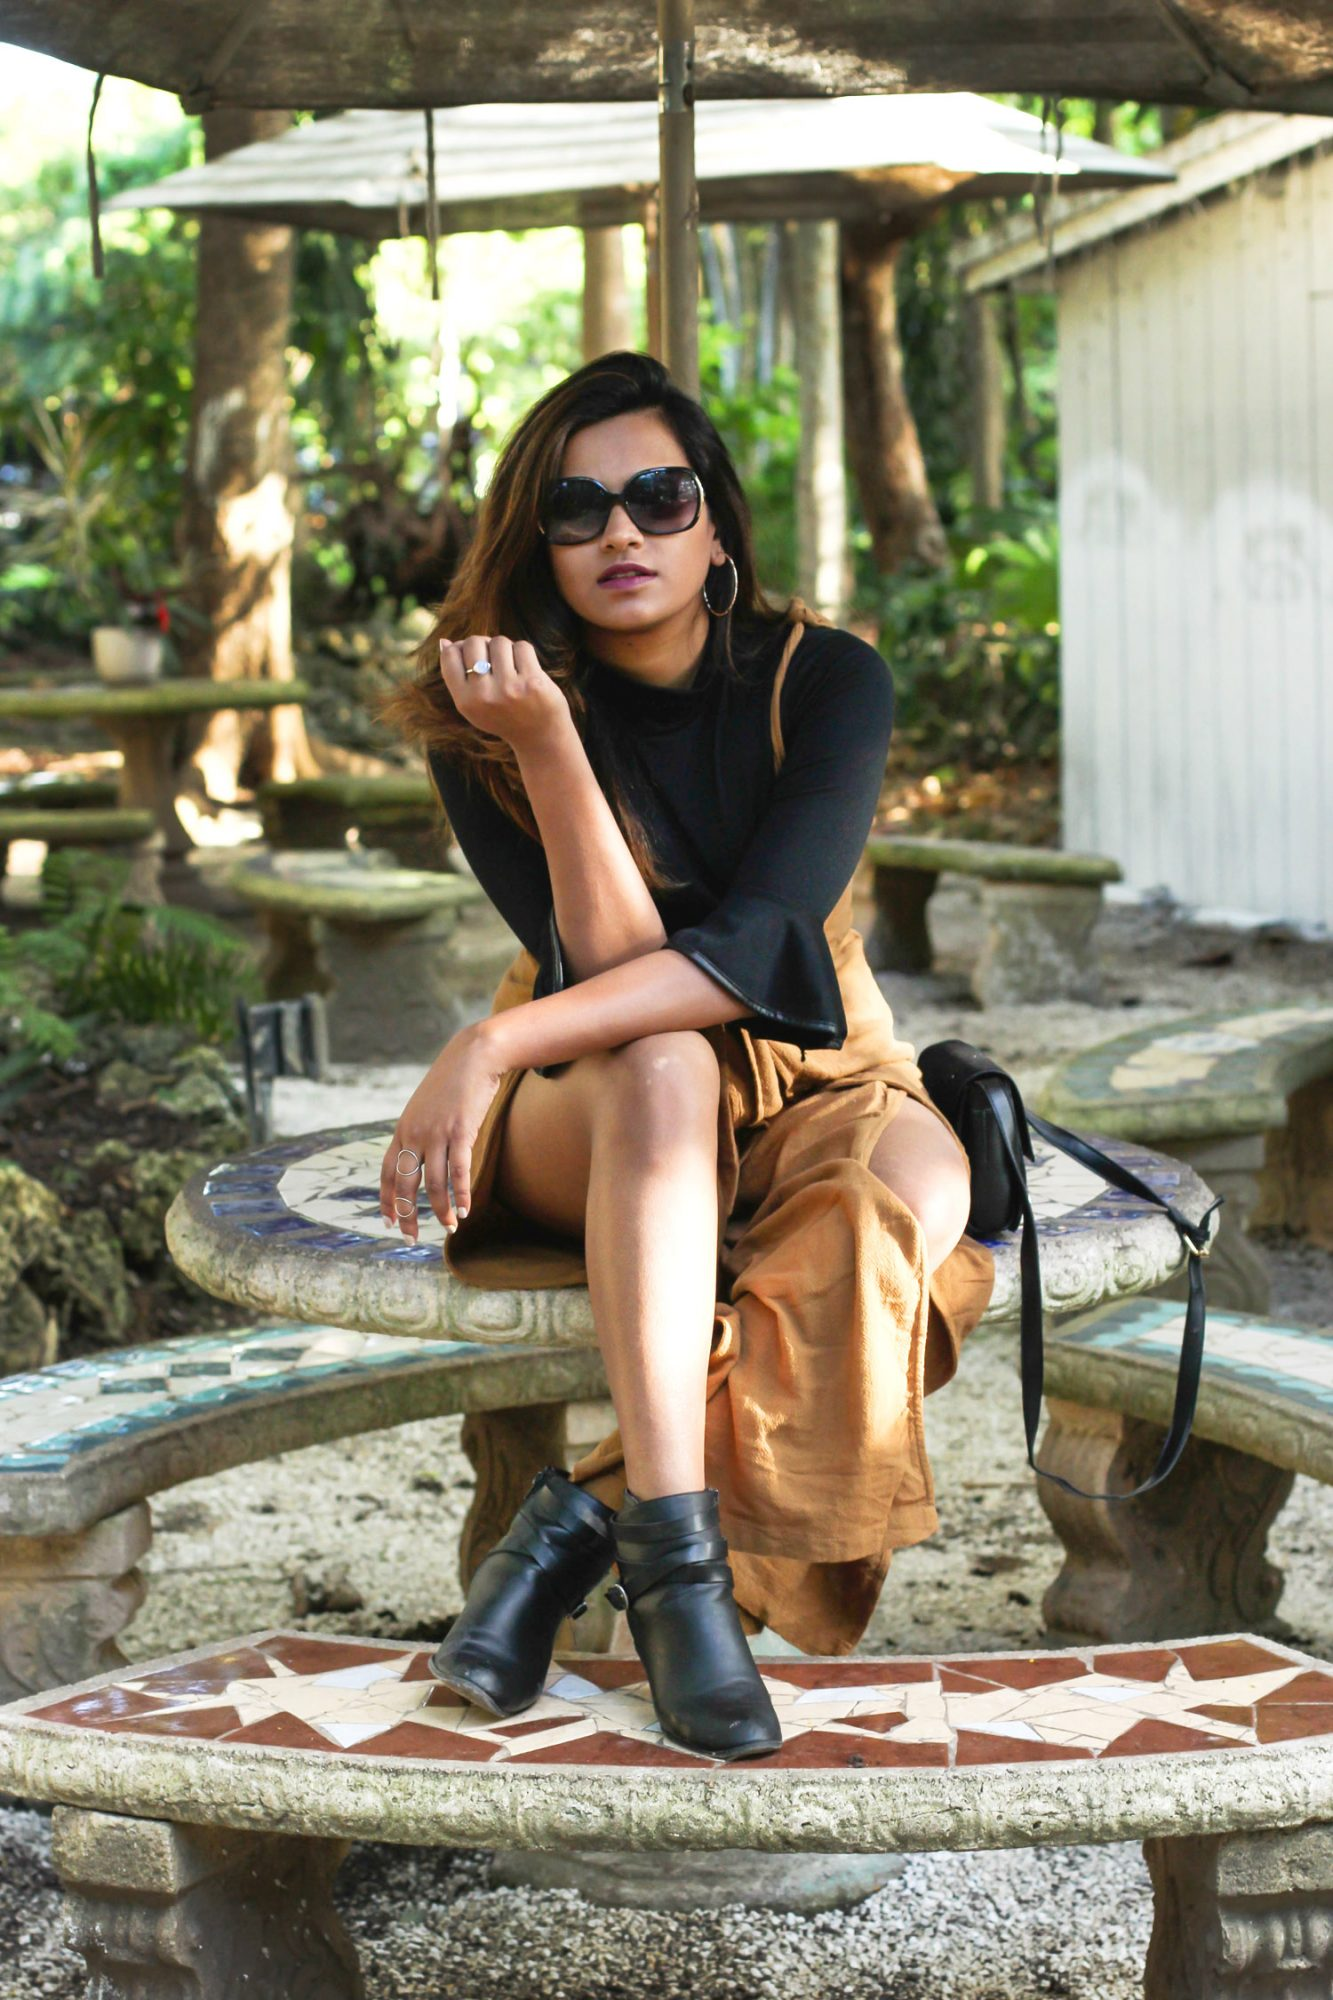 afroza-khan-miami-top-fashion-influencer